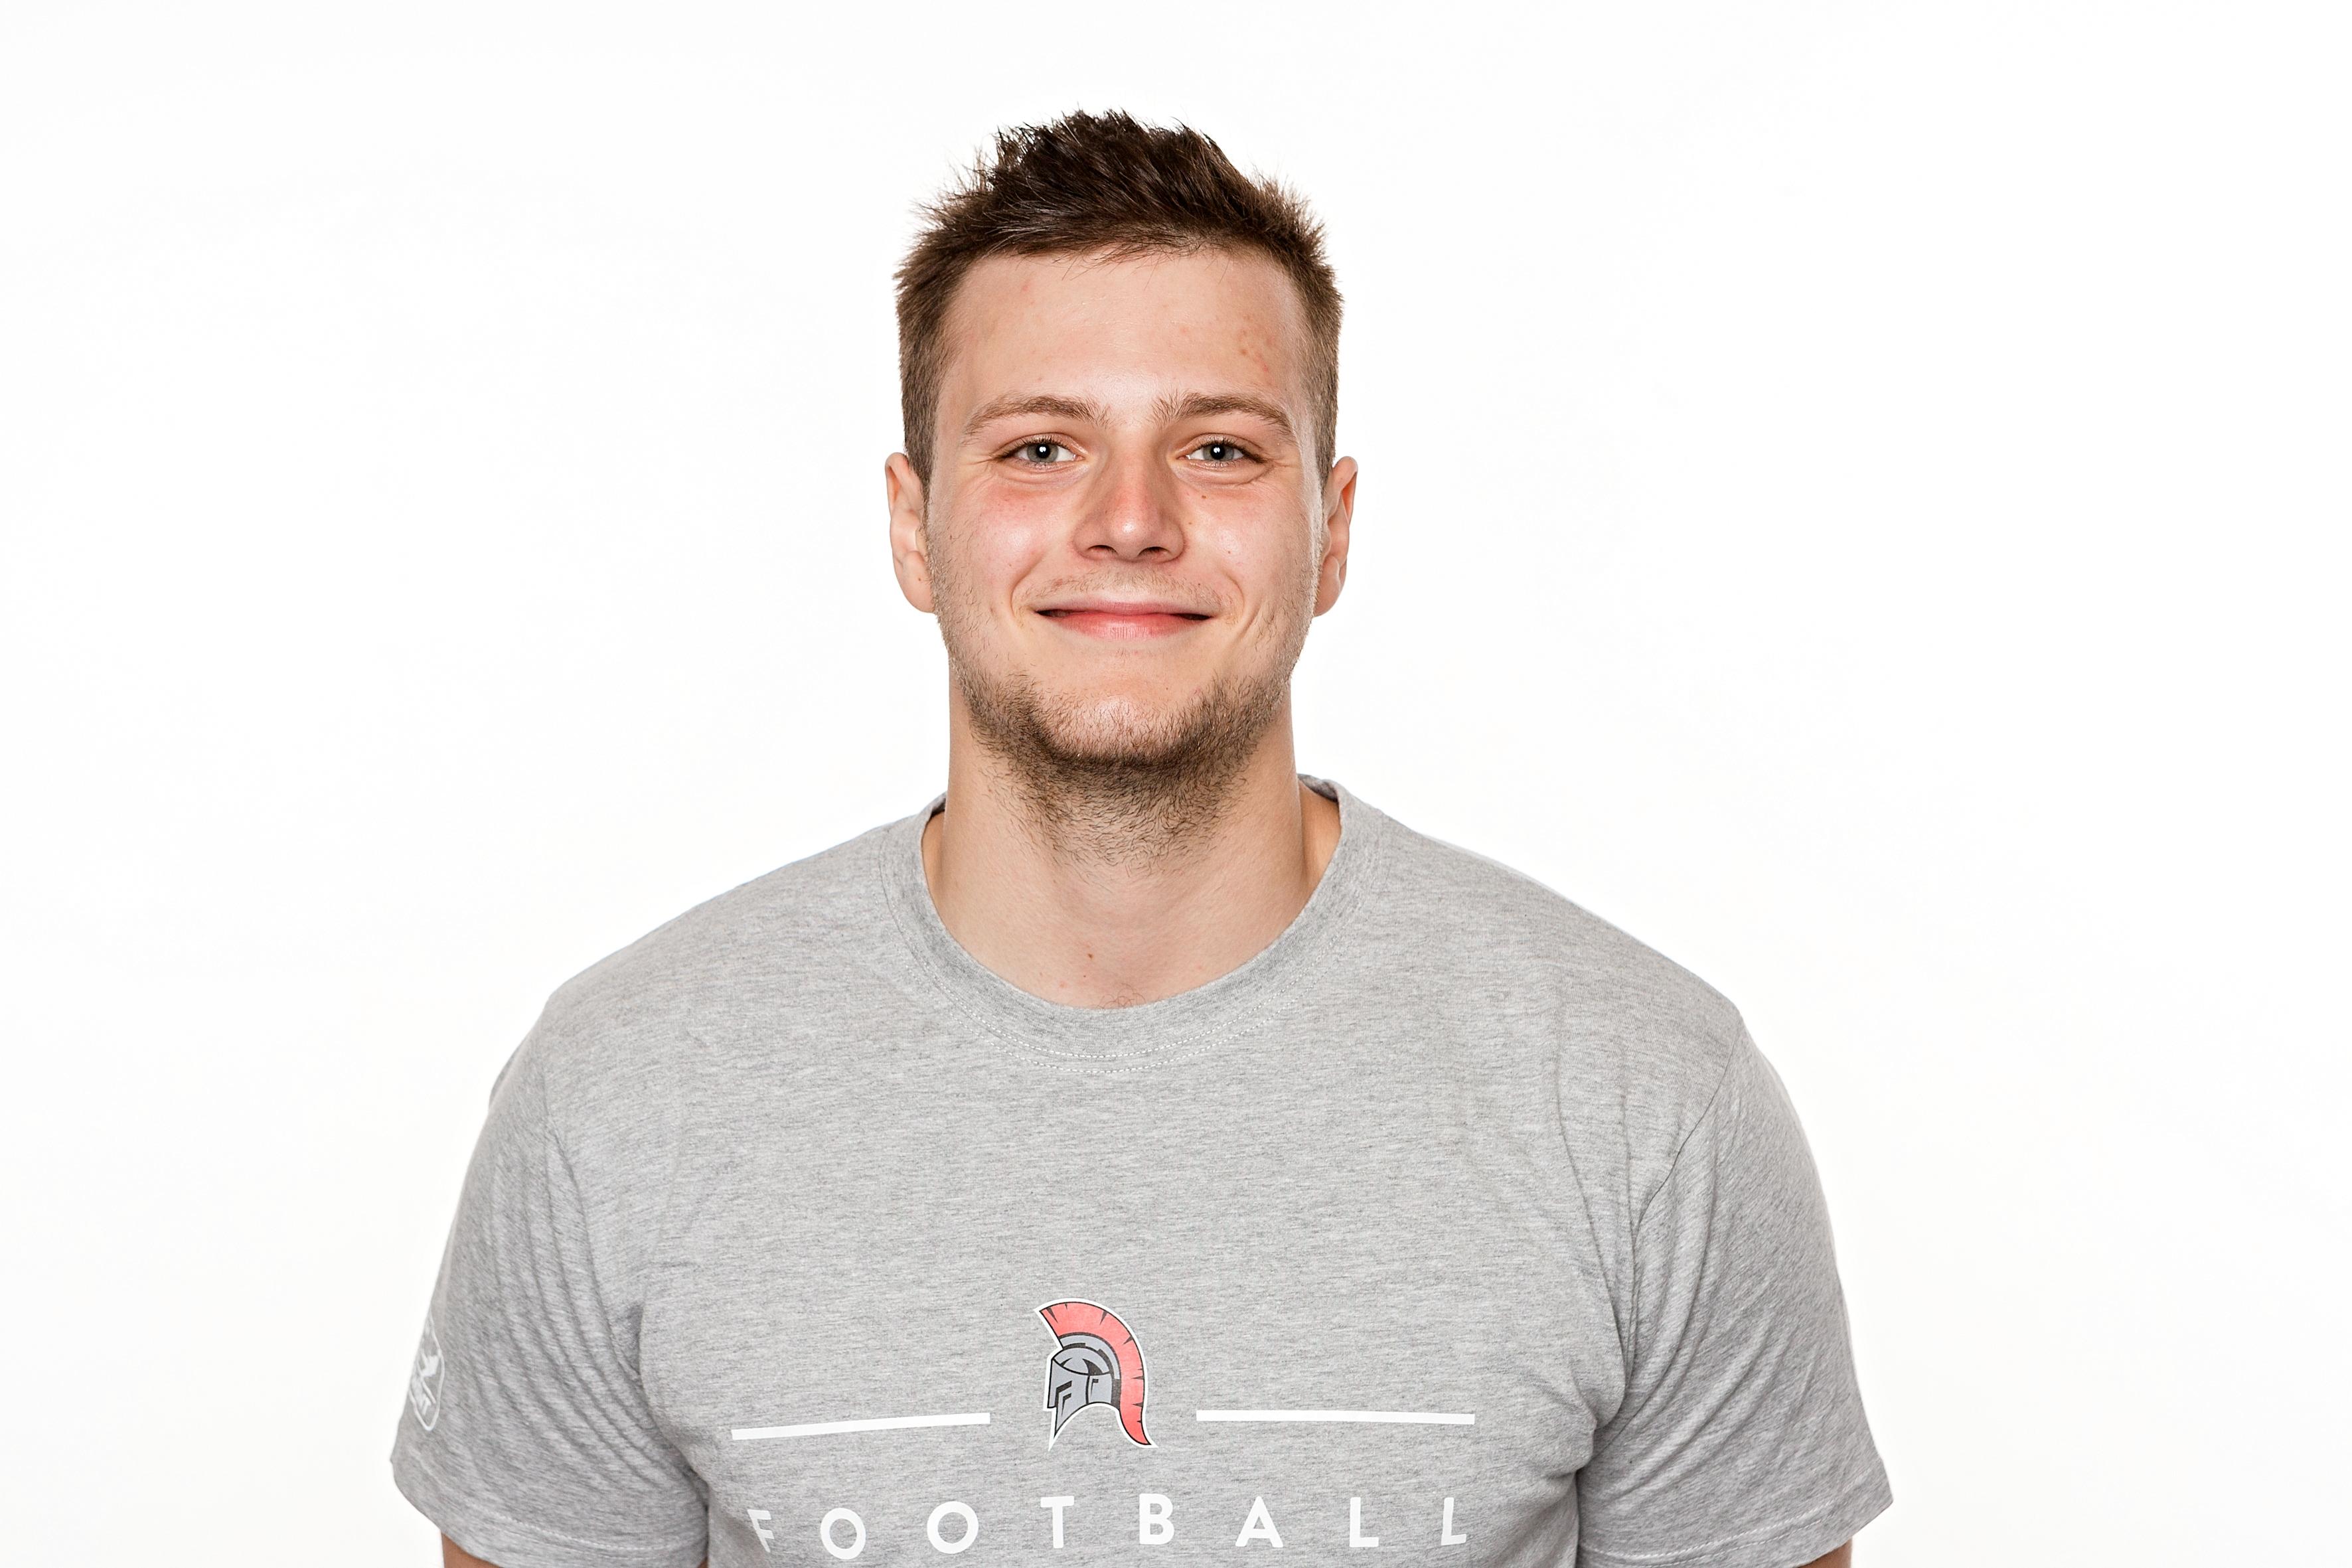 Fabian Kratz